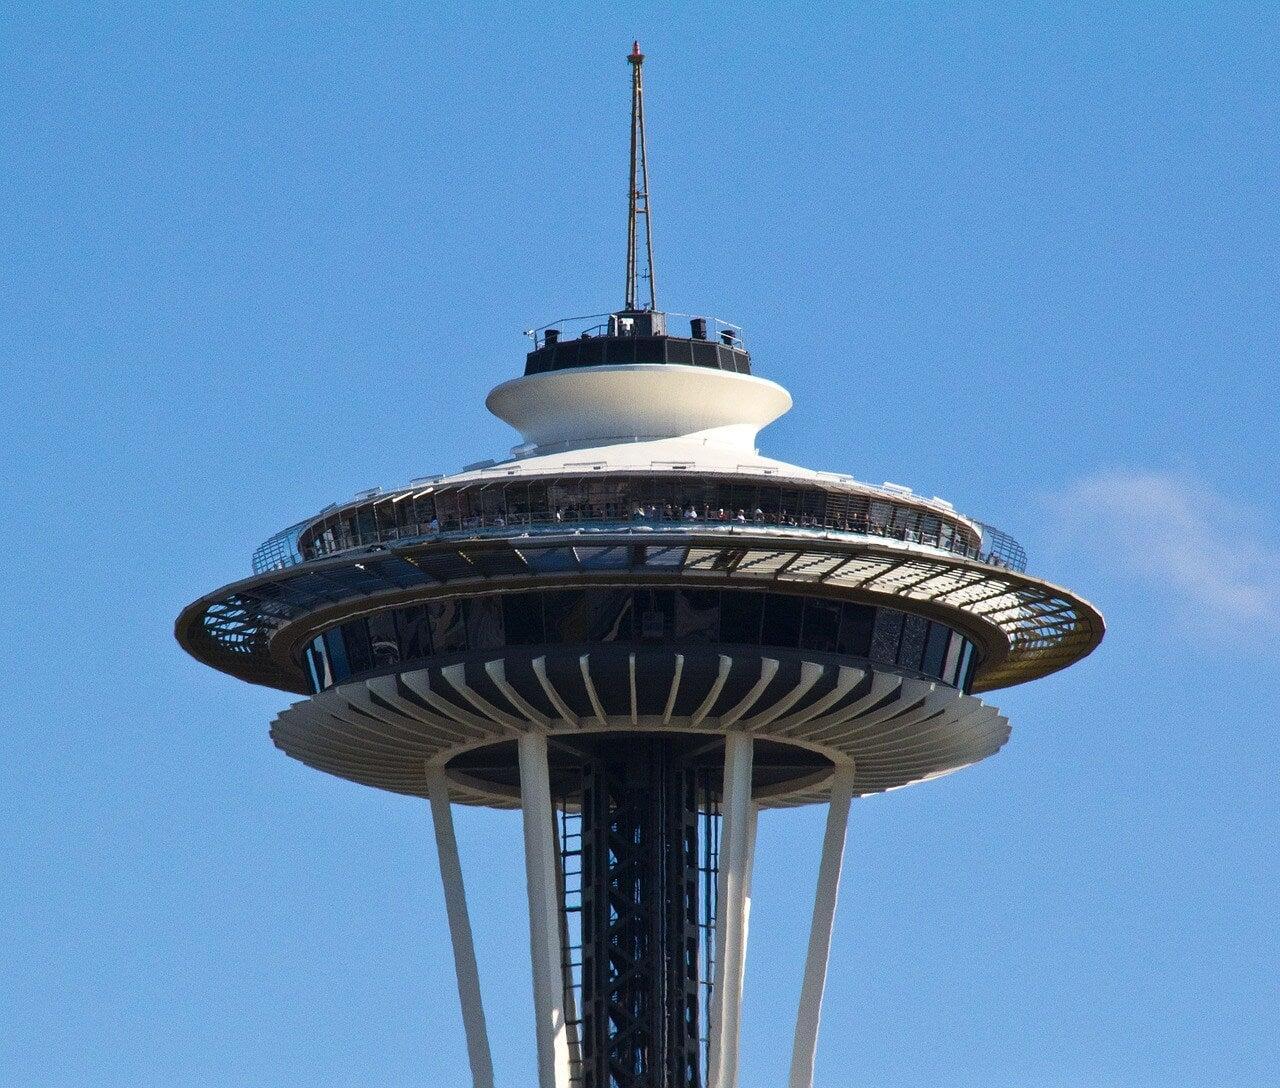 Plataforma de la torre Space Needle de Seattle